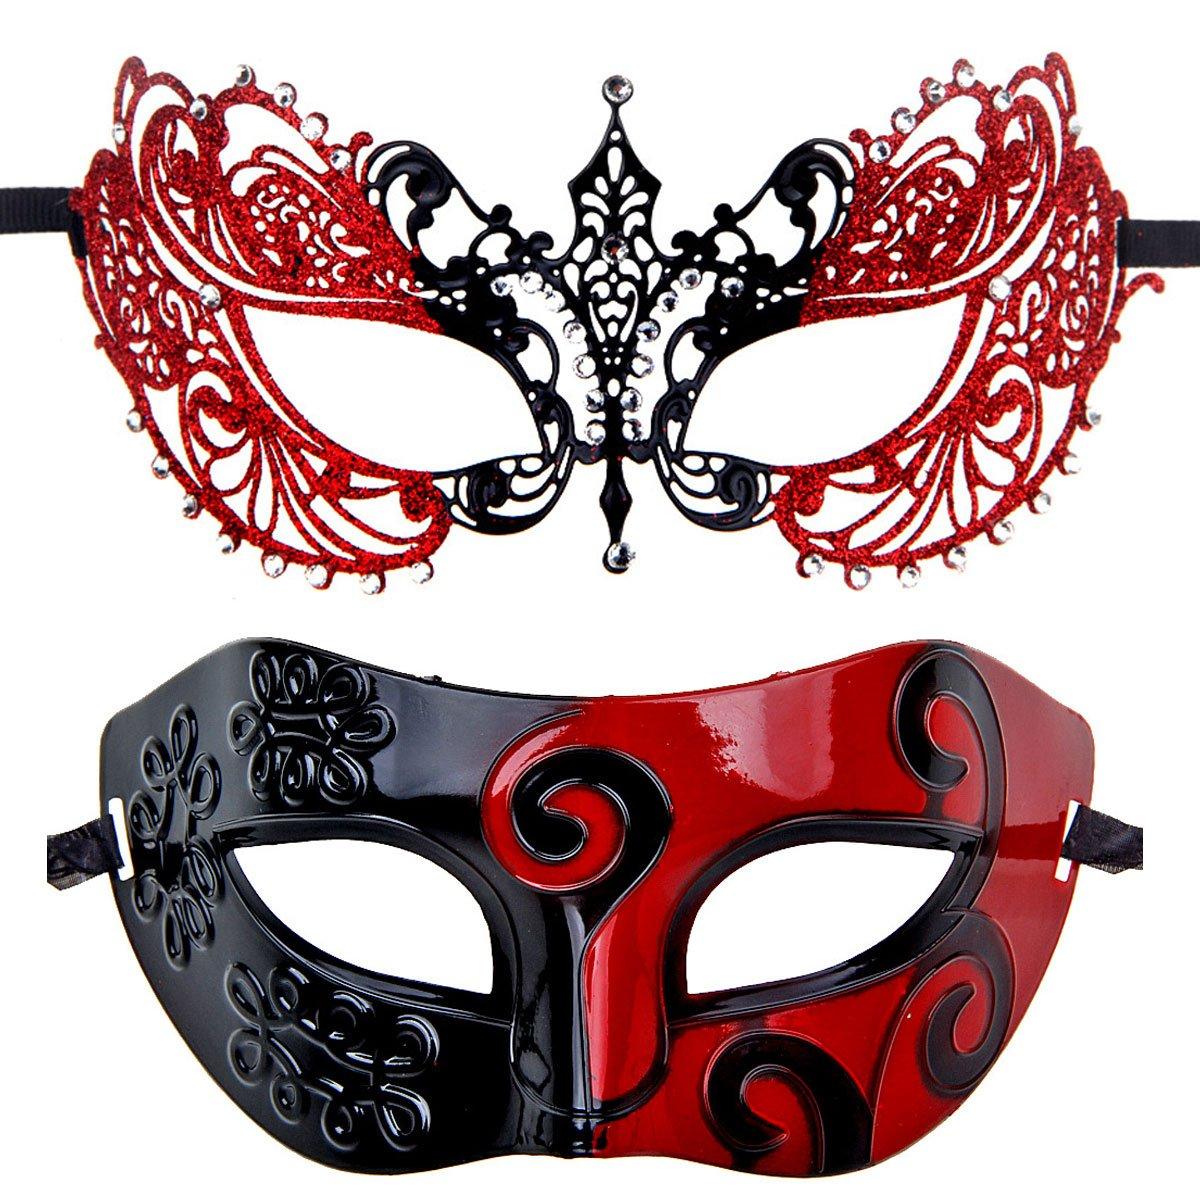 ECOSCO Couple Masquerade Mask Women Men Mardi Gras Venetian Ball Mask (Black-Red+Black-red4)